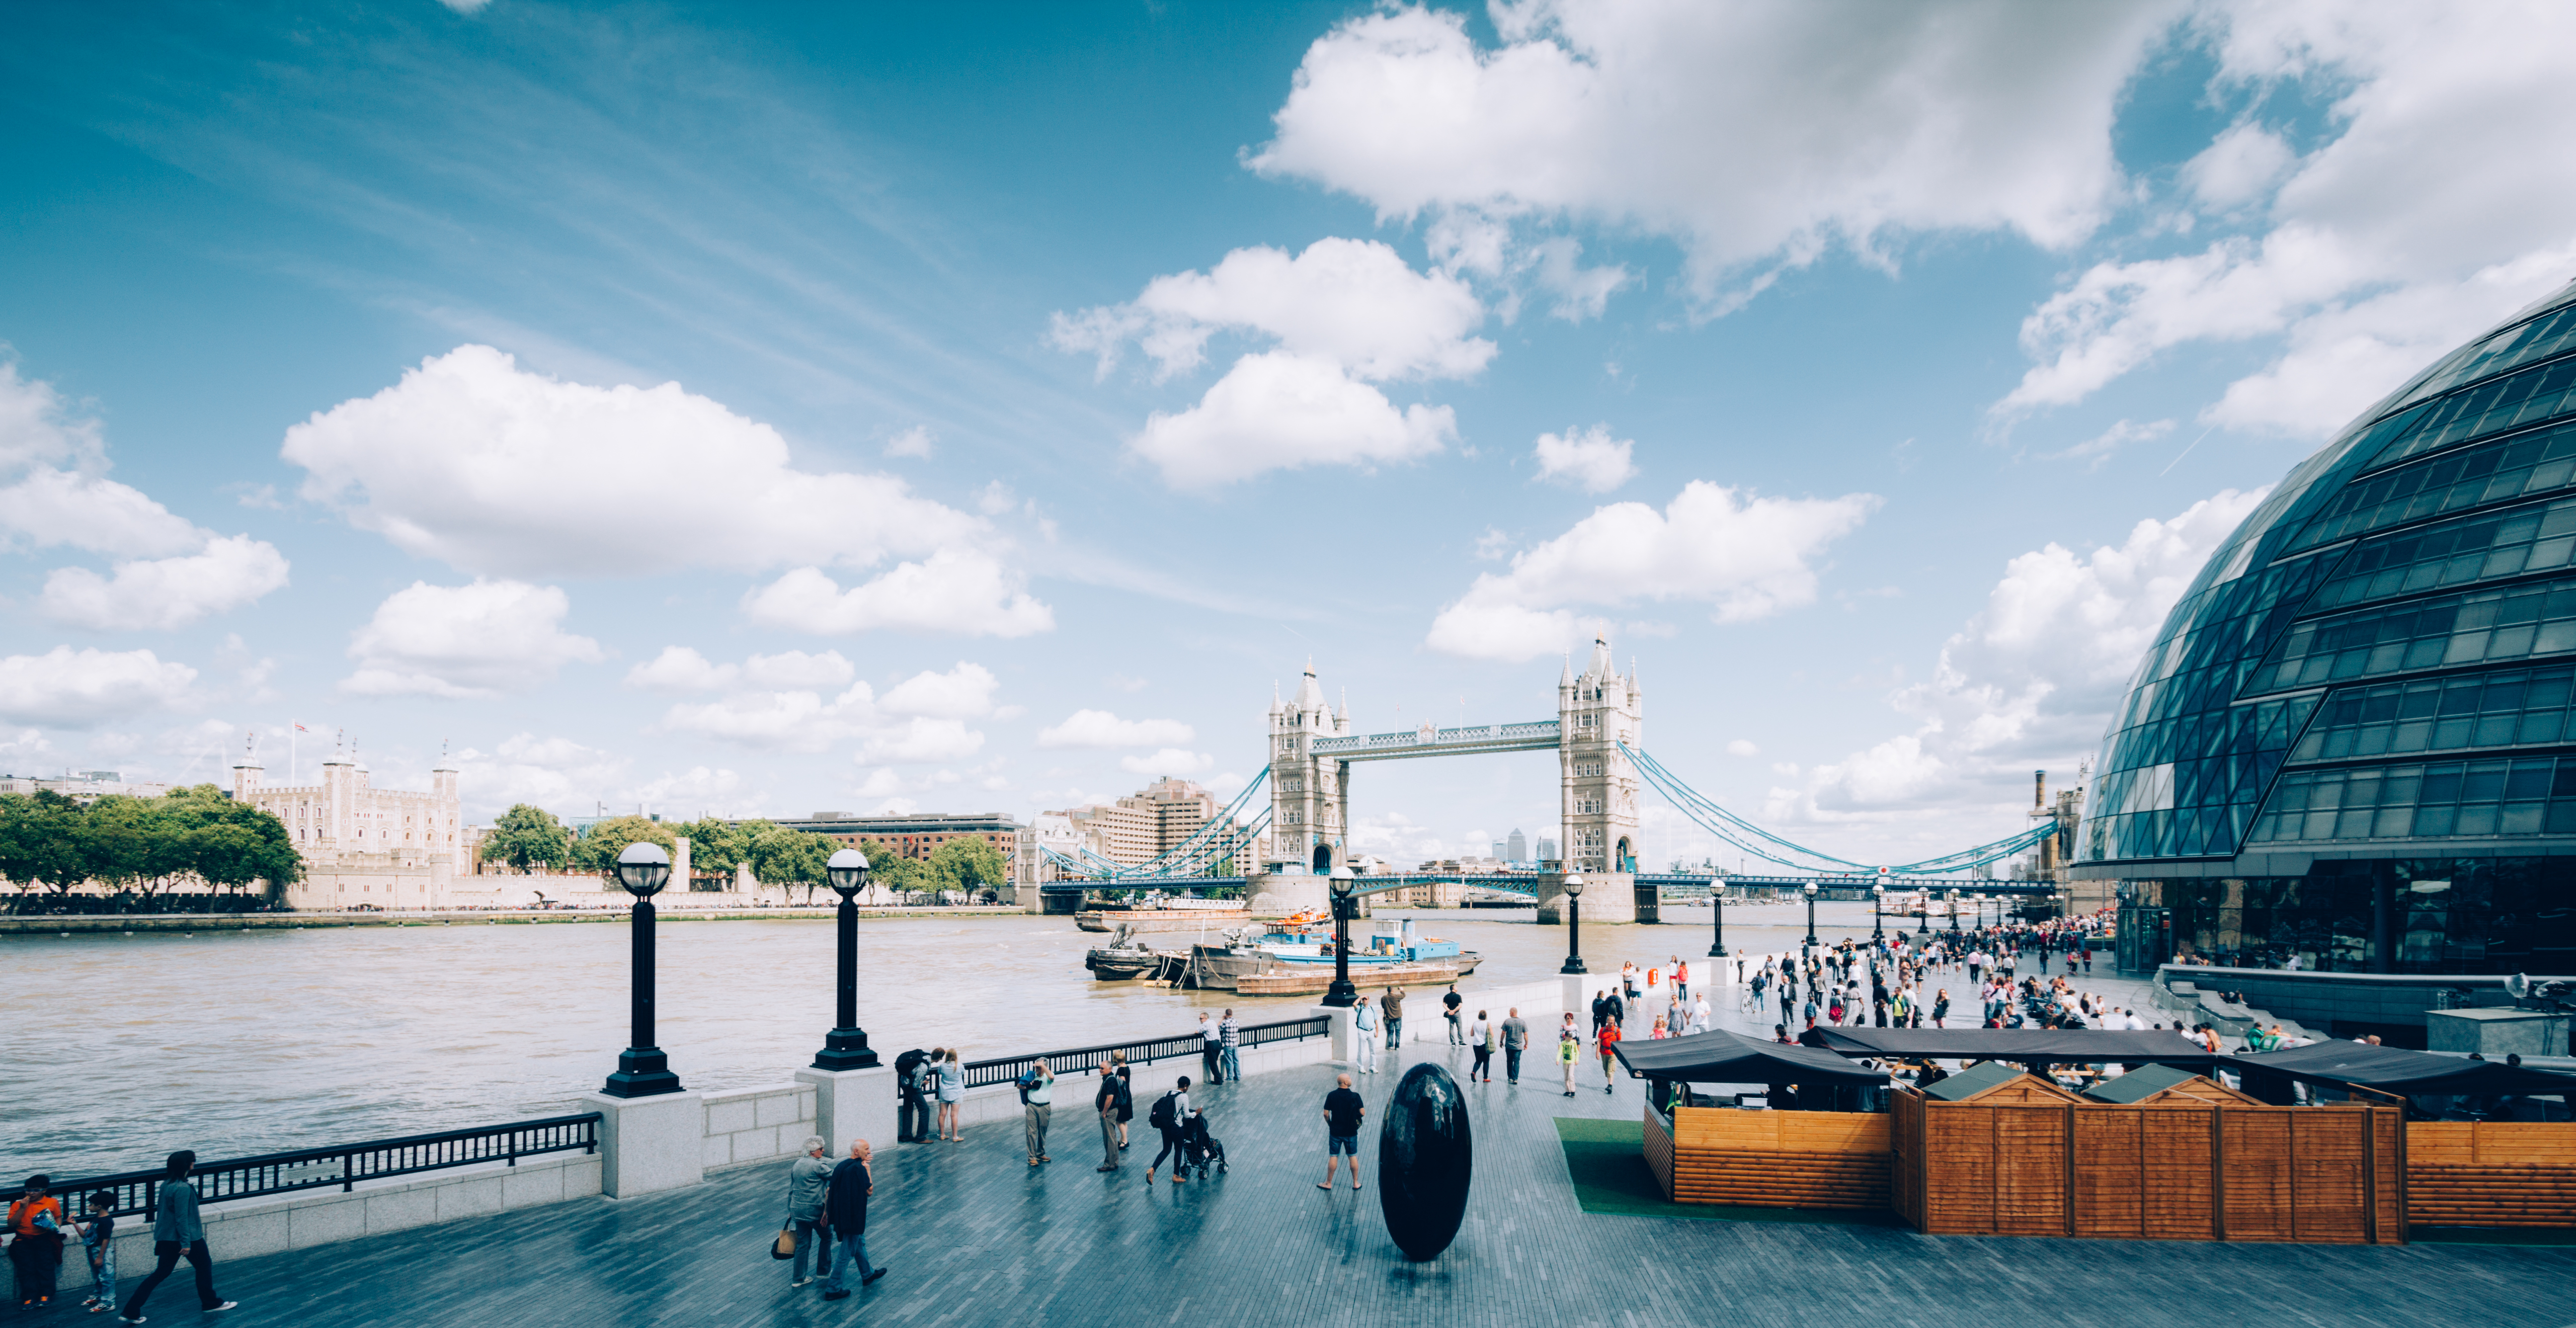 Tower Bridge - 5184x2672